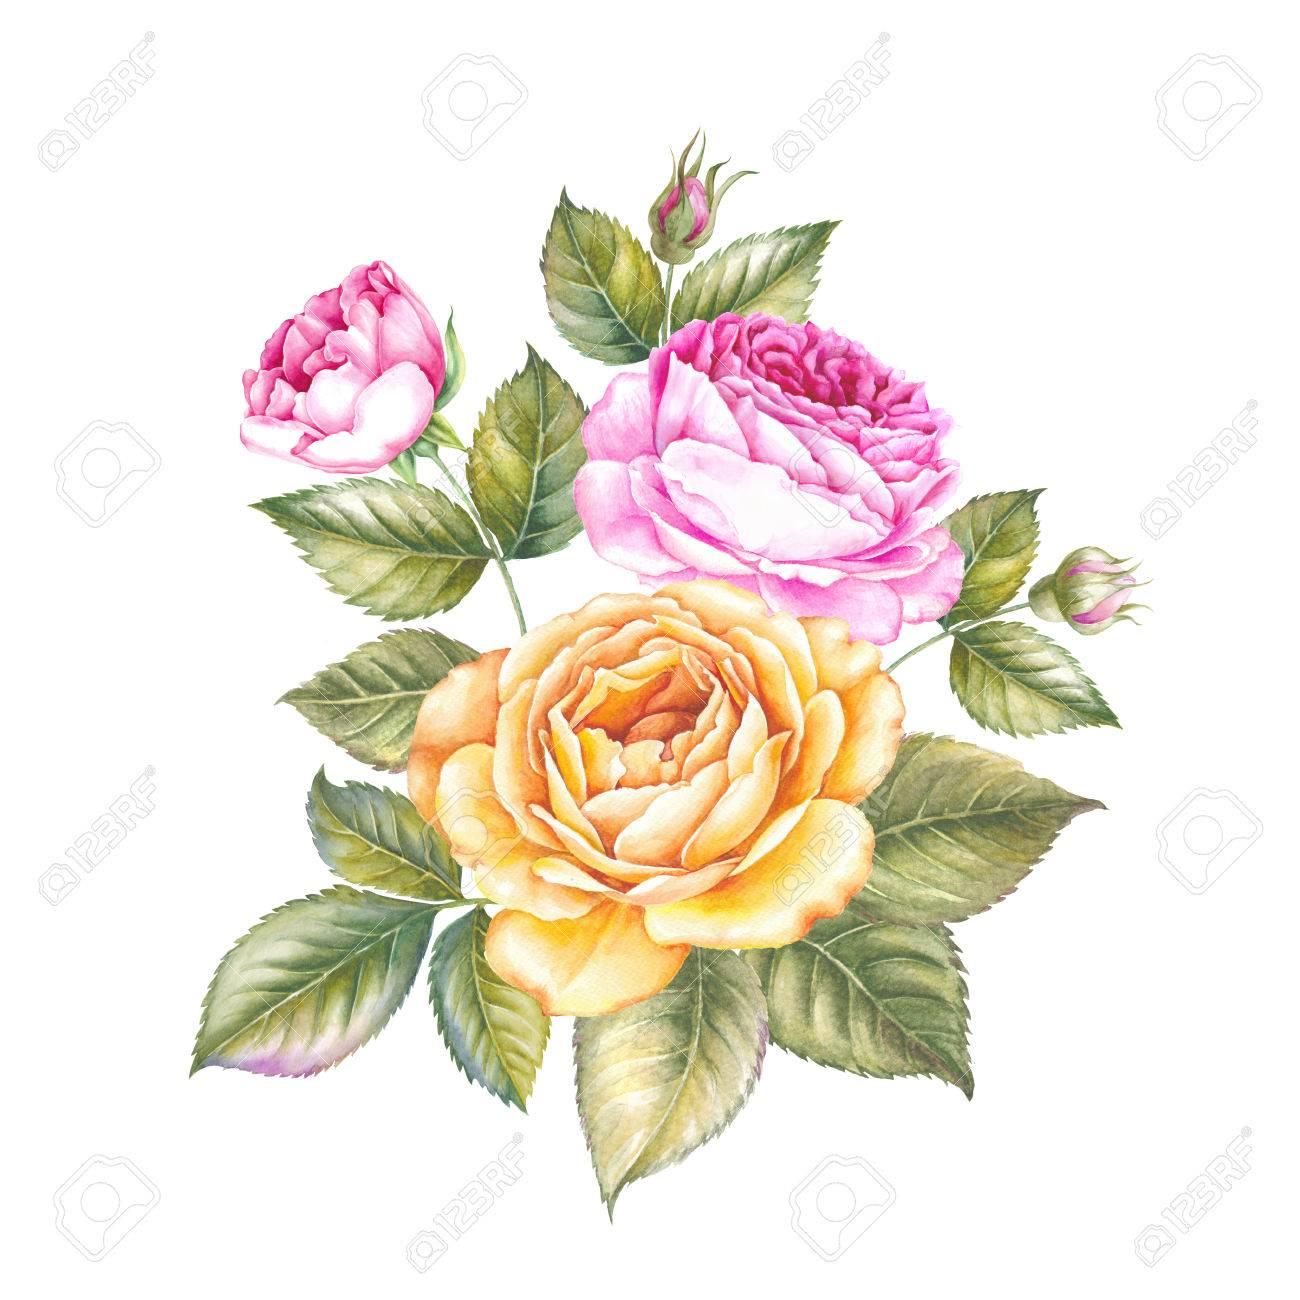 Blooming rose flower watercolor illustration cute pink roses blooming rose flower watercolor illustration cute pink roses in vintage style for design handmade mightylinksfo